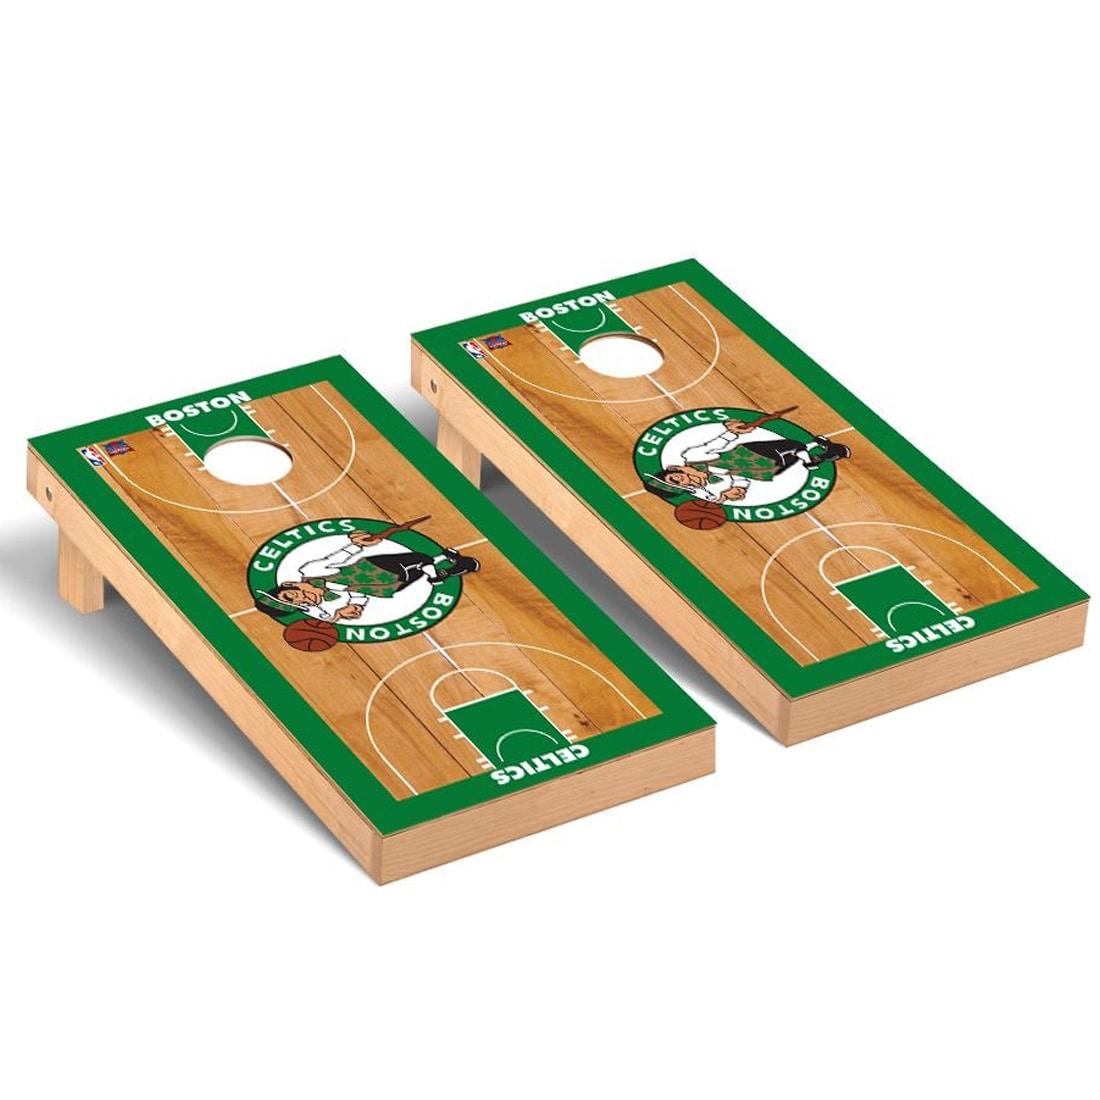 Boston Celtics 2' x 4' Court Cornhole Game Set